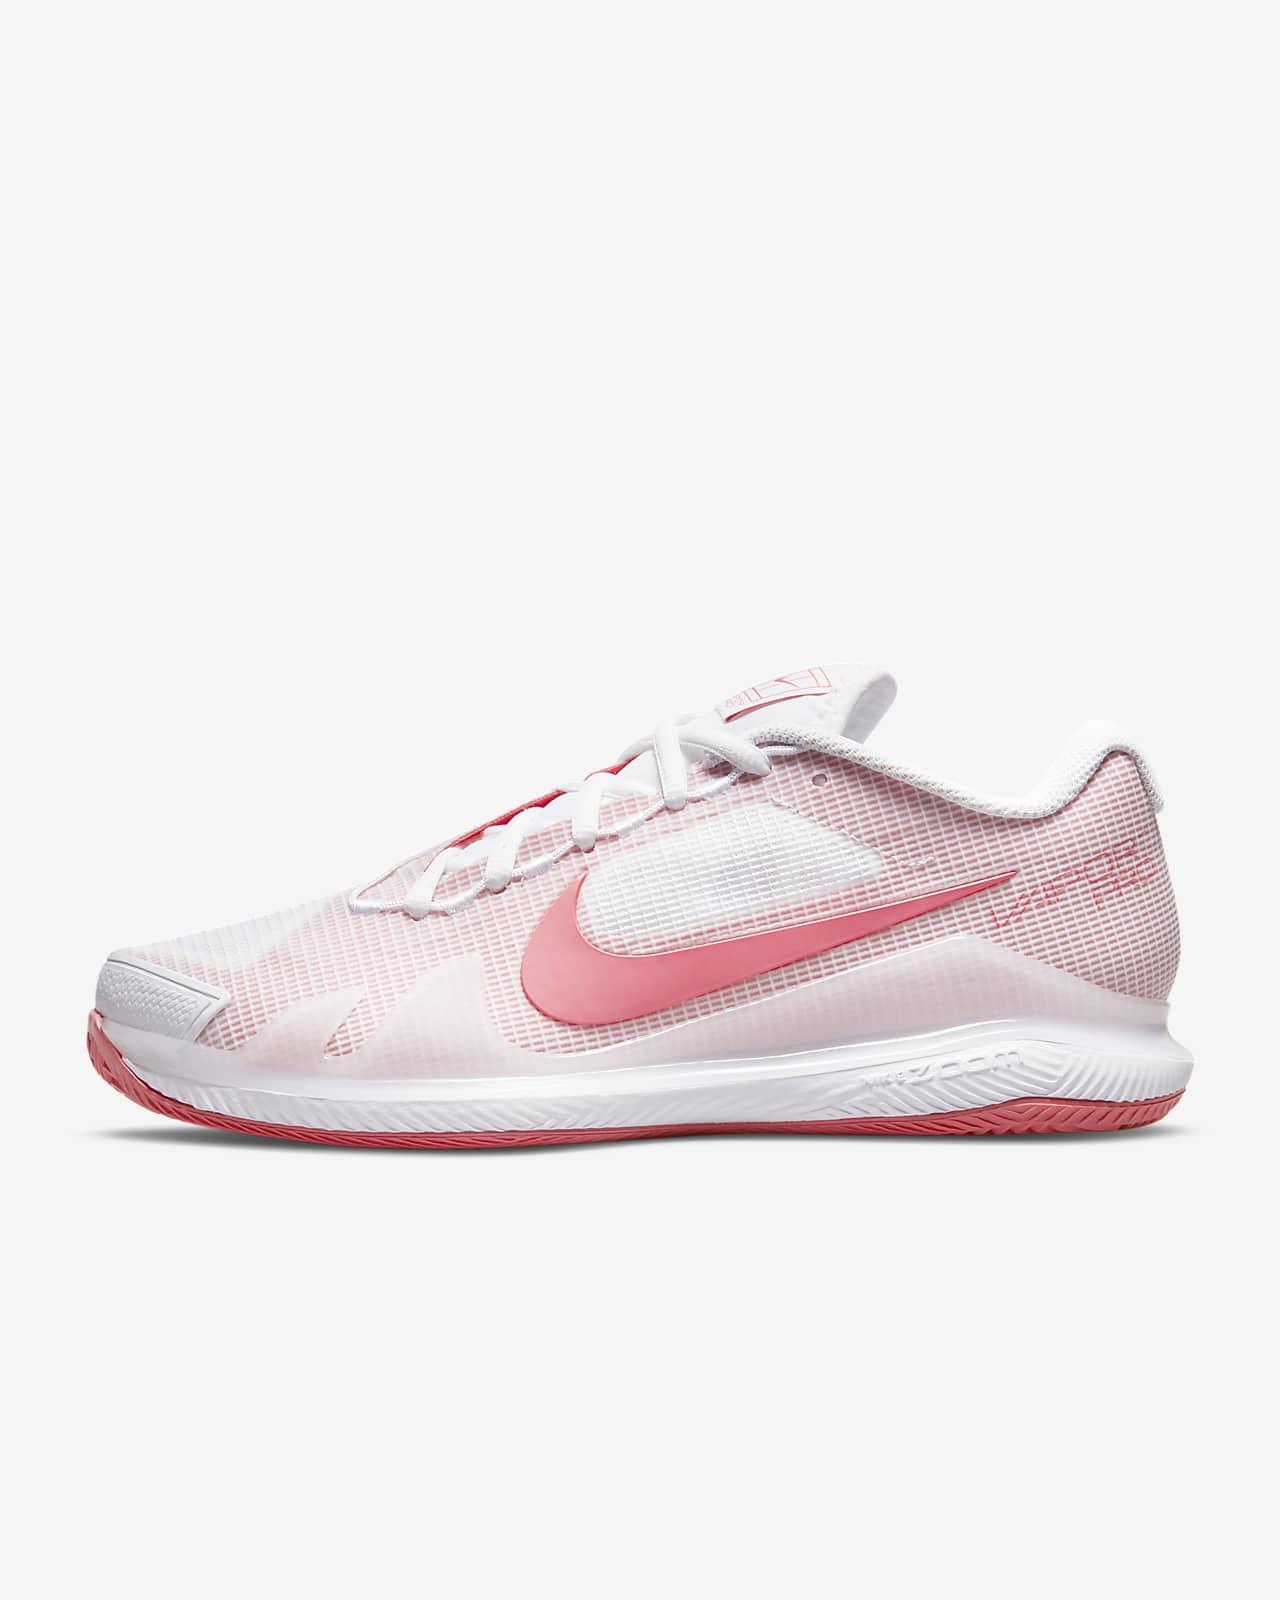 NikeCourt Air Zoom Vapor Pro Damen-Tennisschuh für Sandplätze